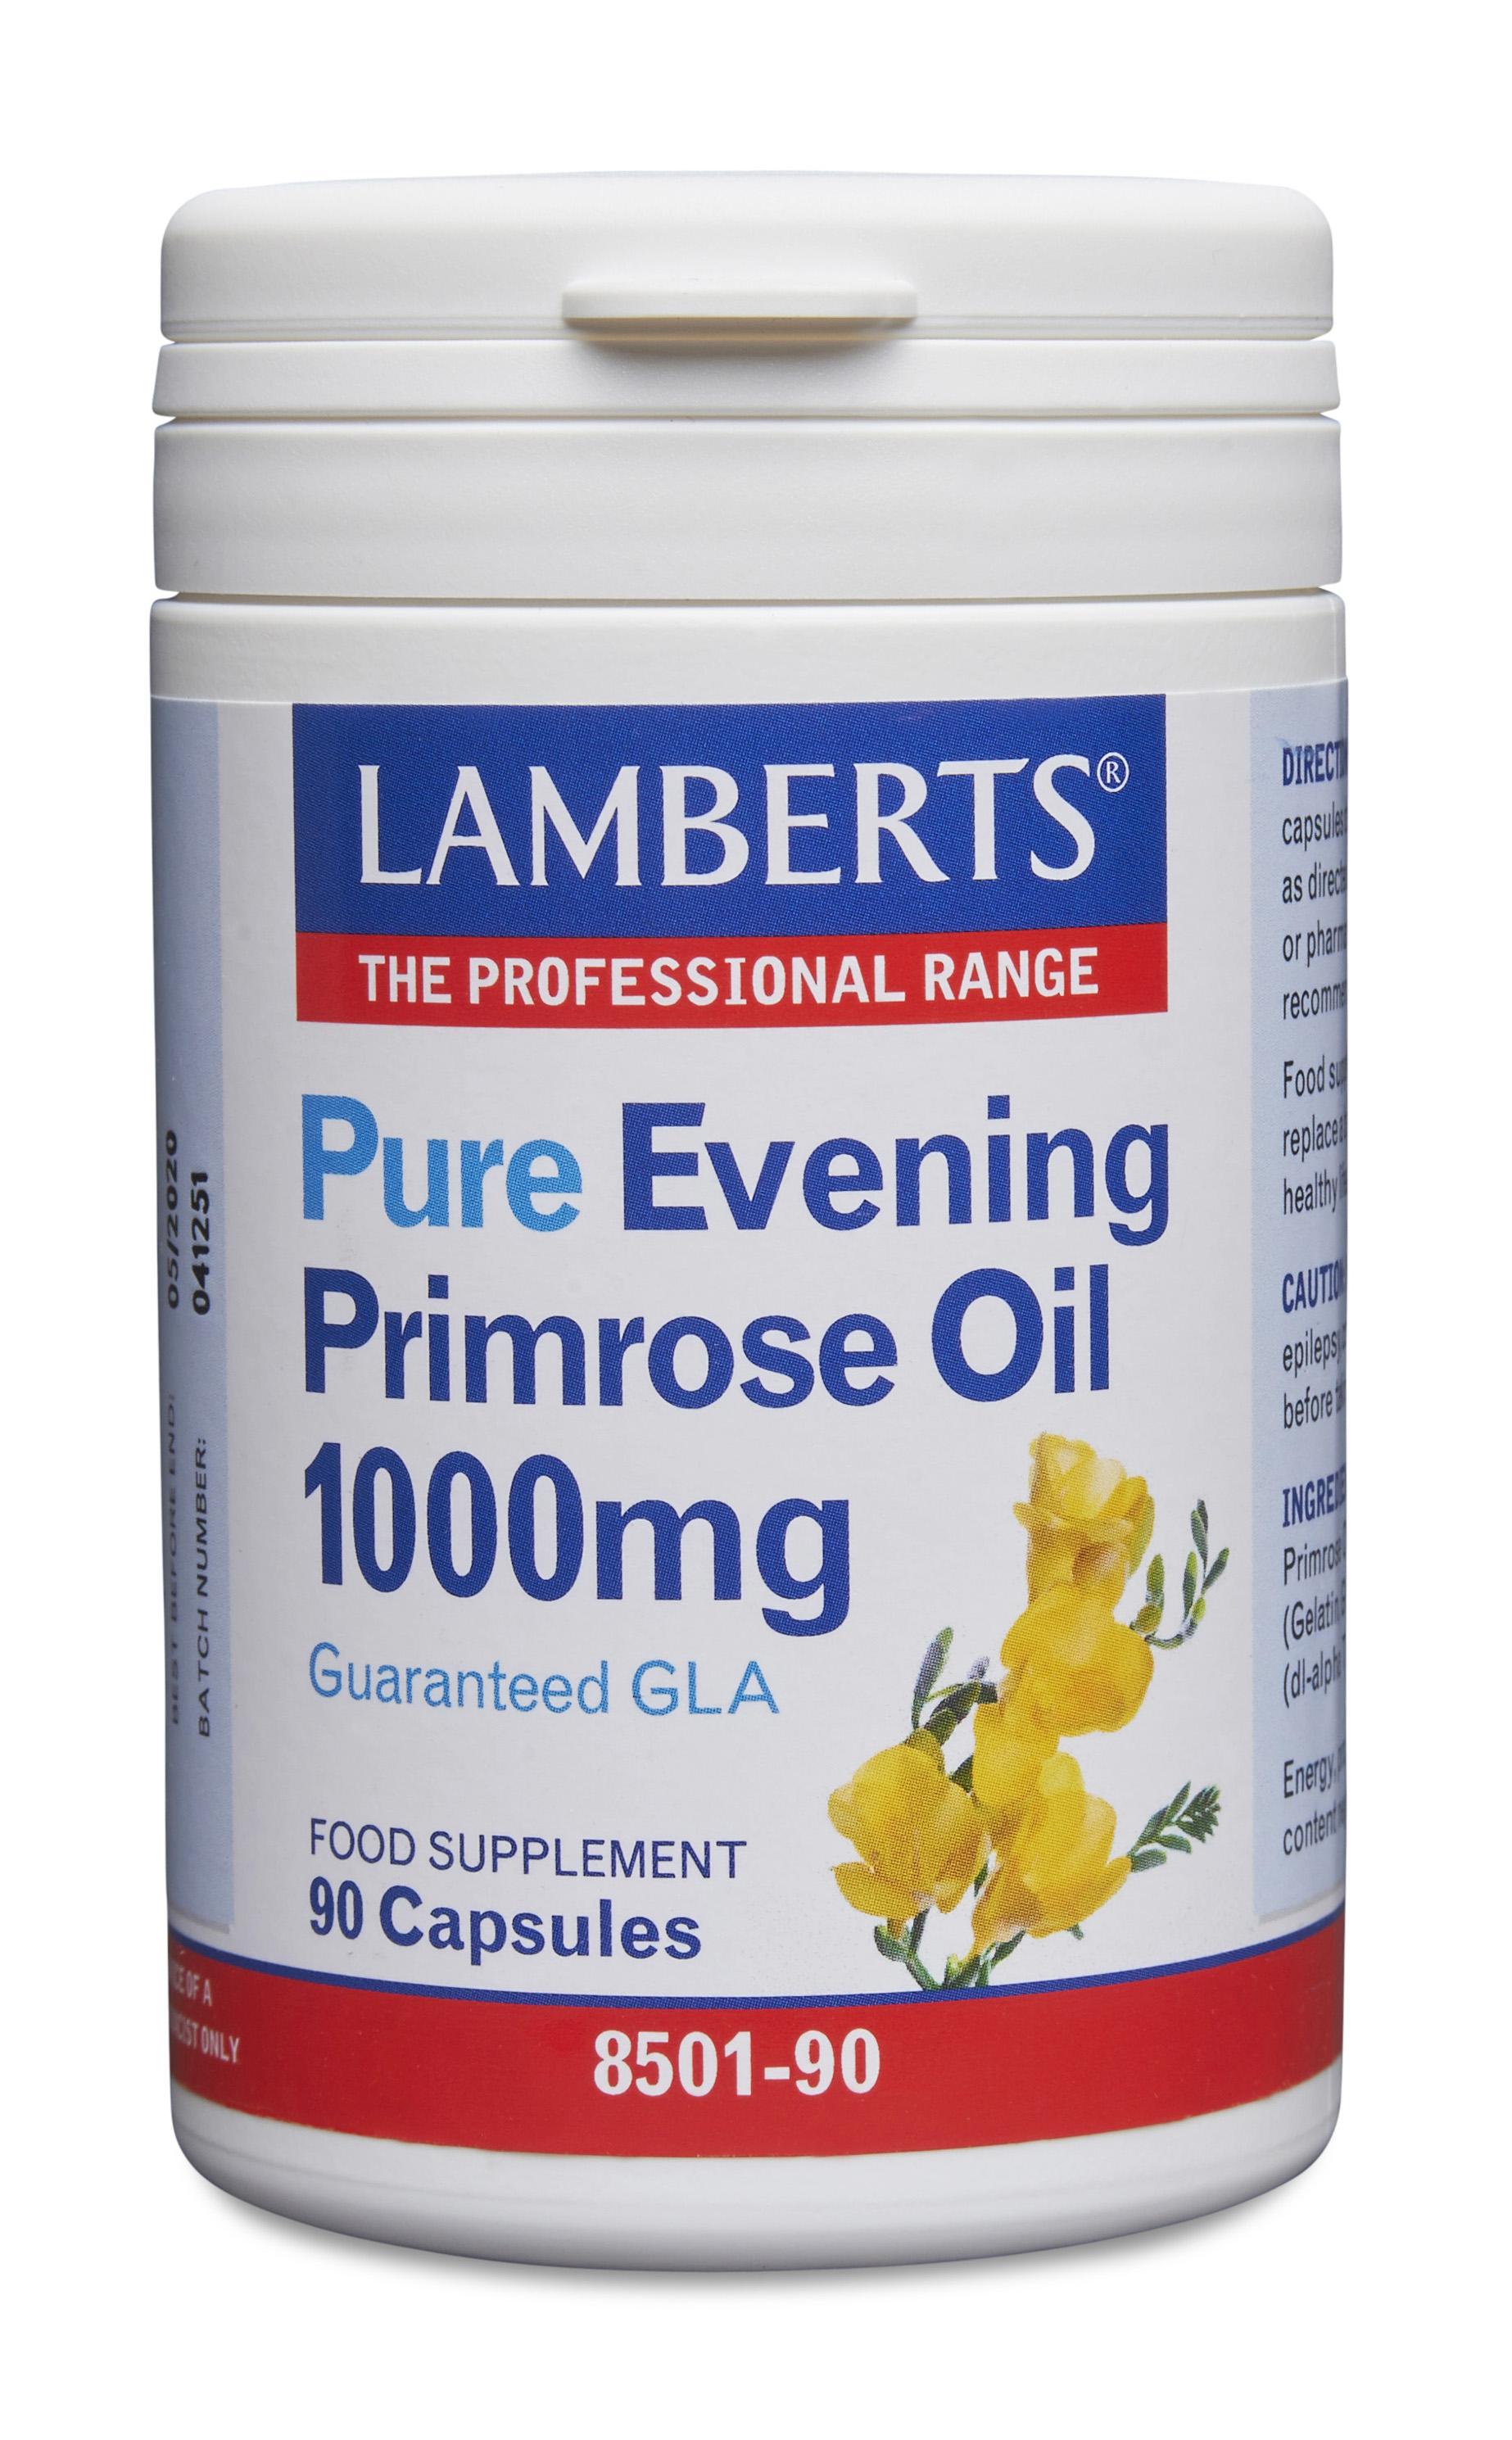 Pure Evening Primrose Oil 1000mg 90's